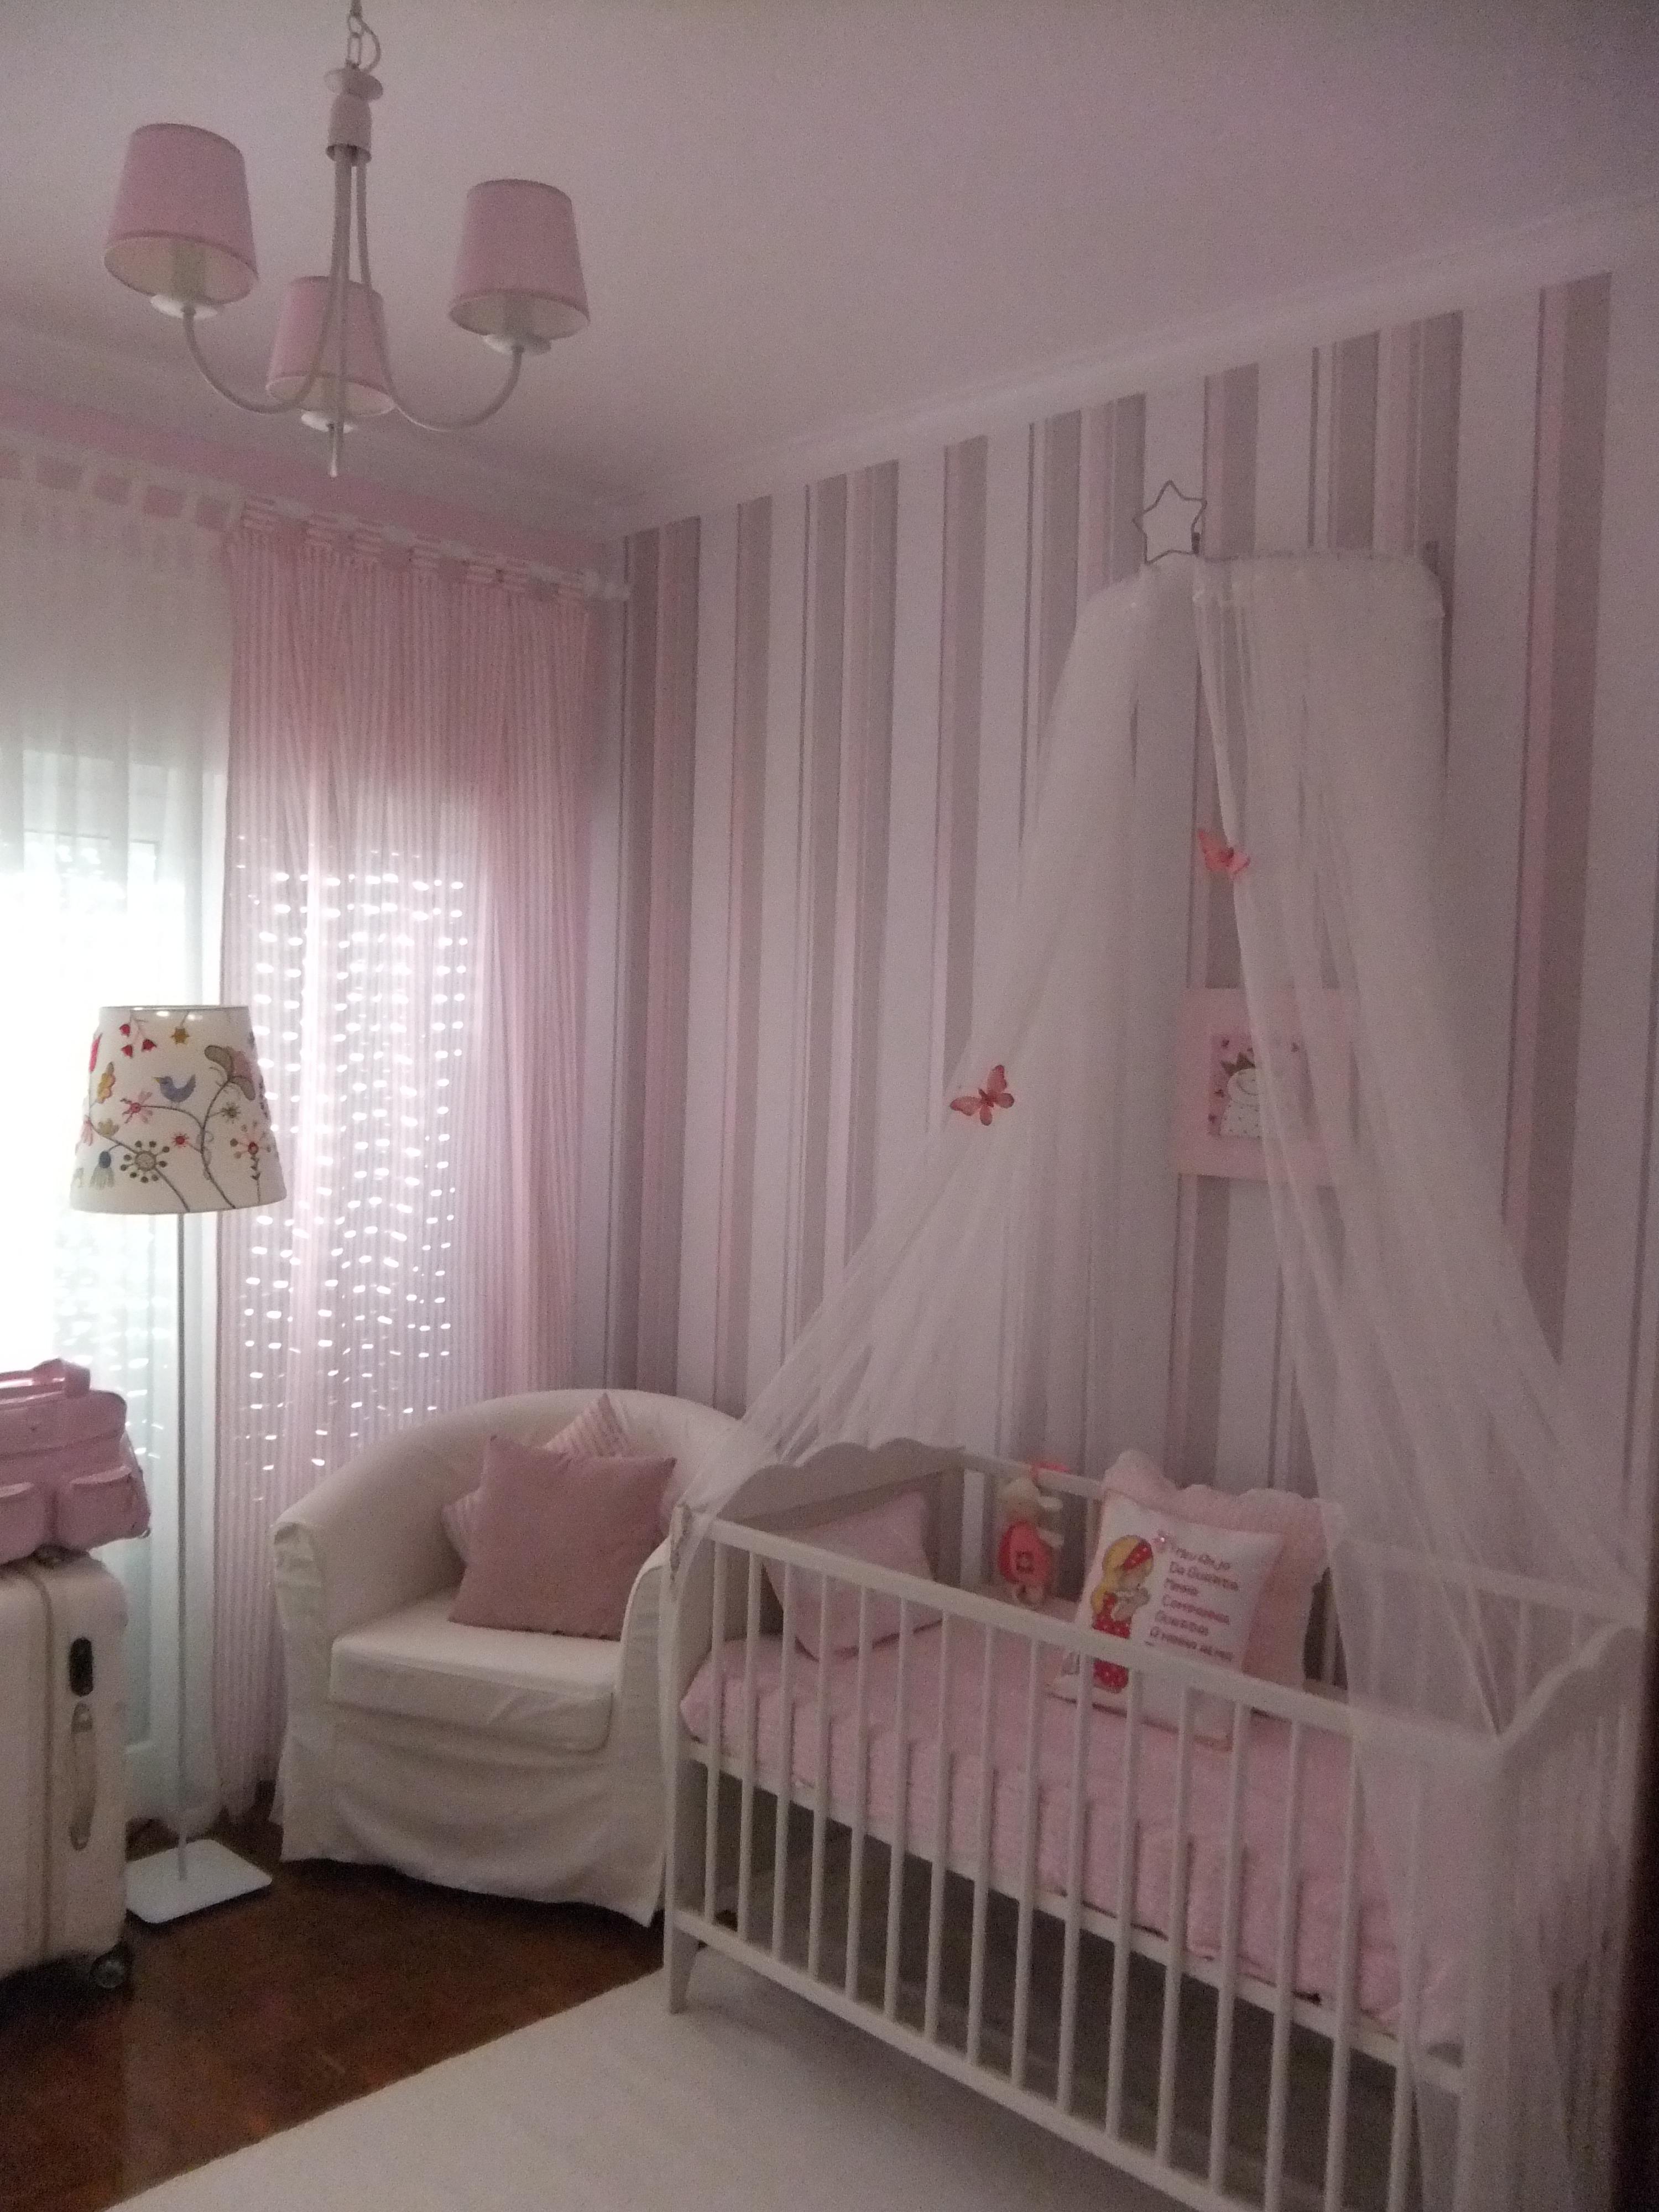 Princess Room Designs: Mariana's Princess Room